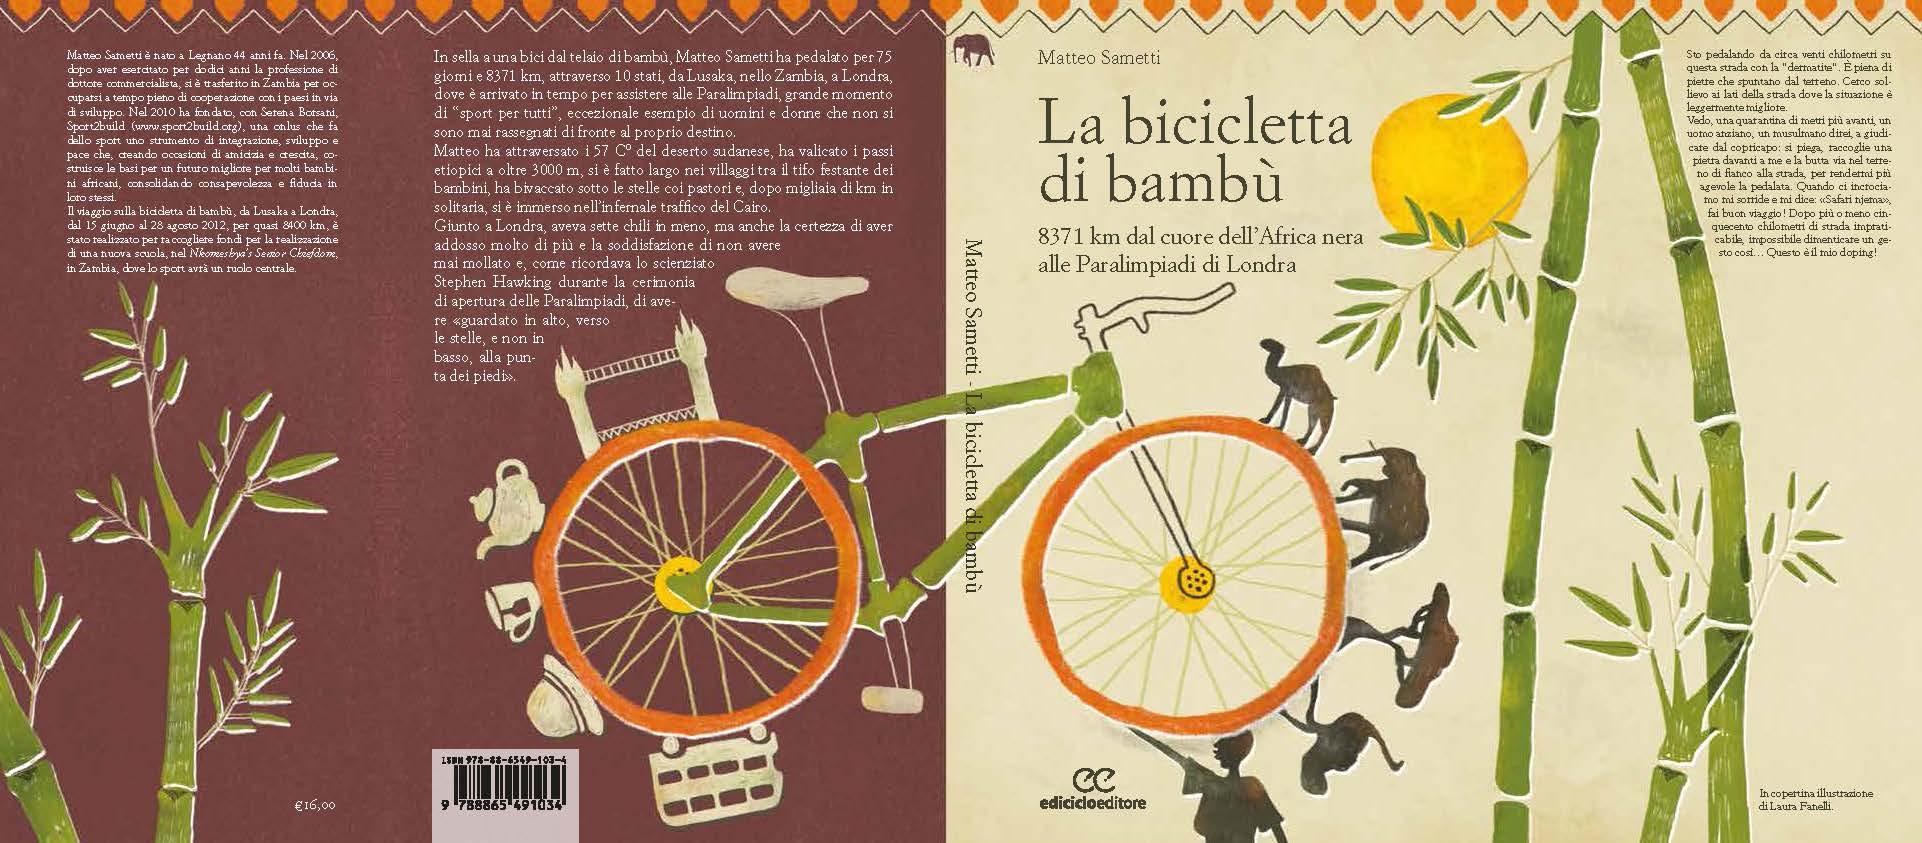 Copertina La bicicletta di bambù